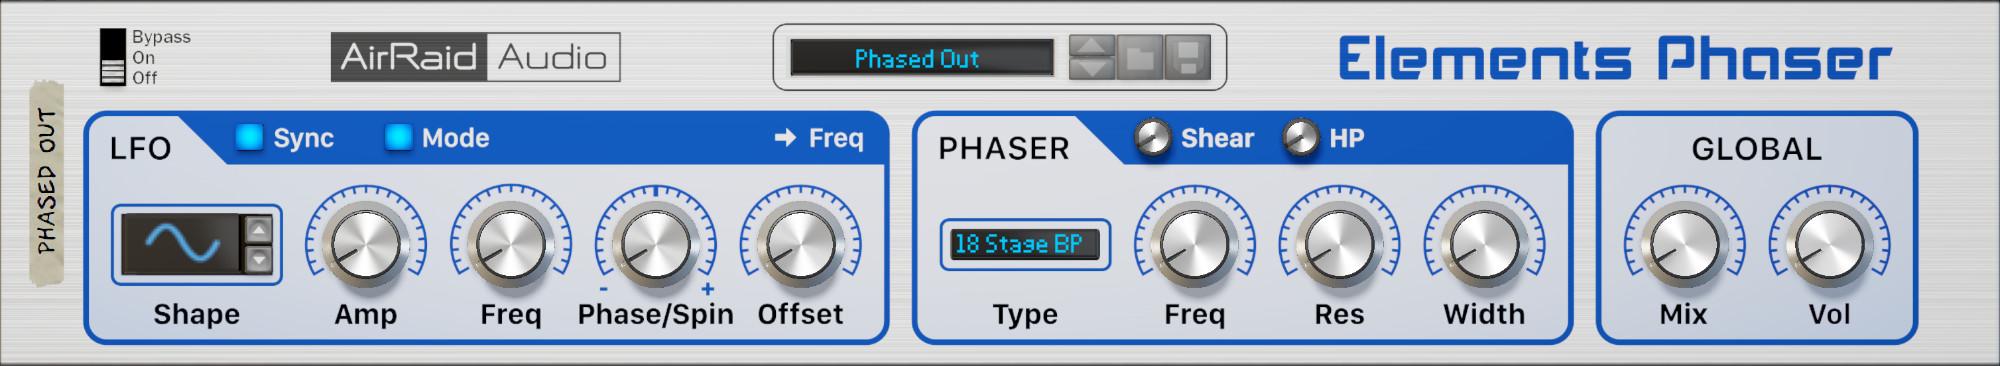 Elements Phaser FRONT